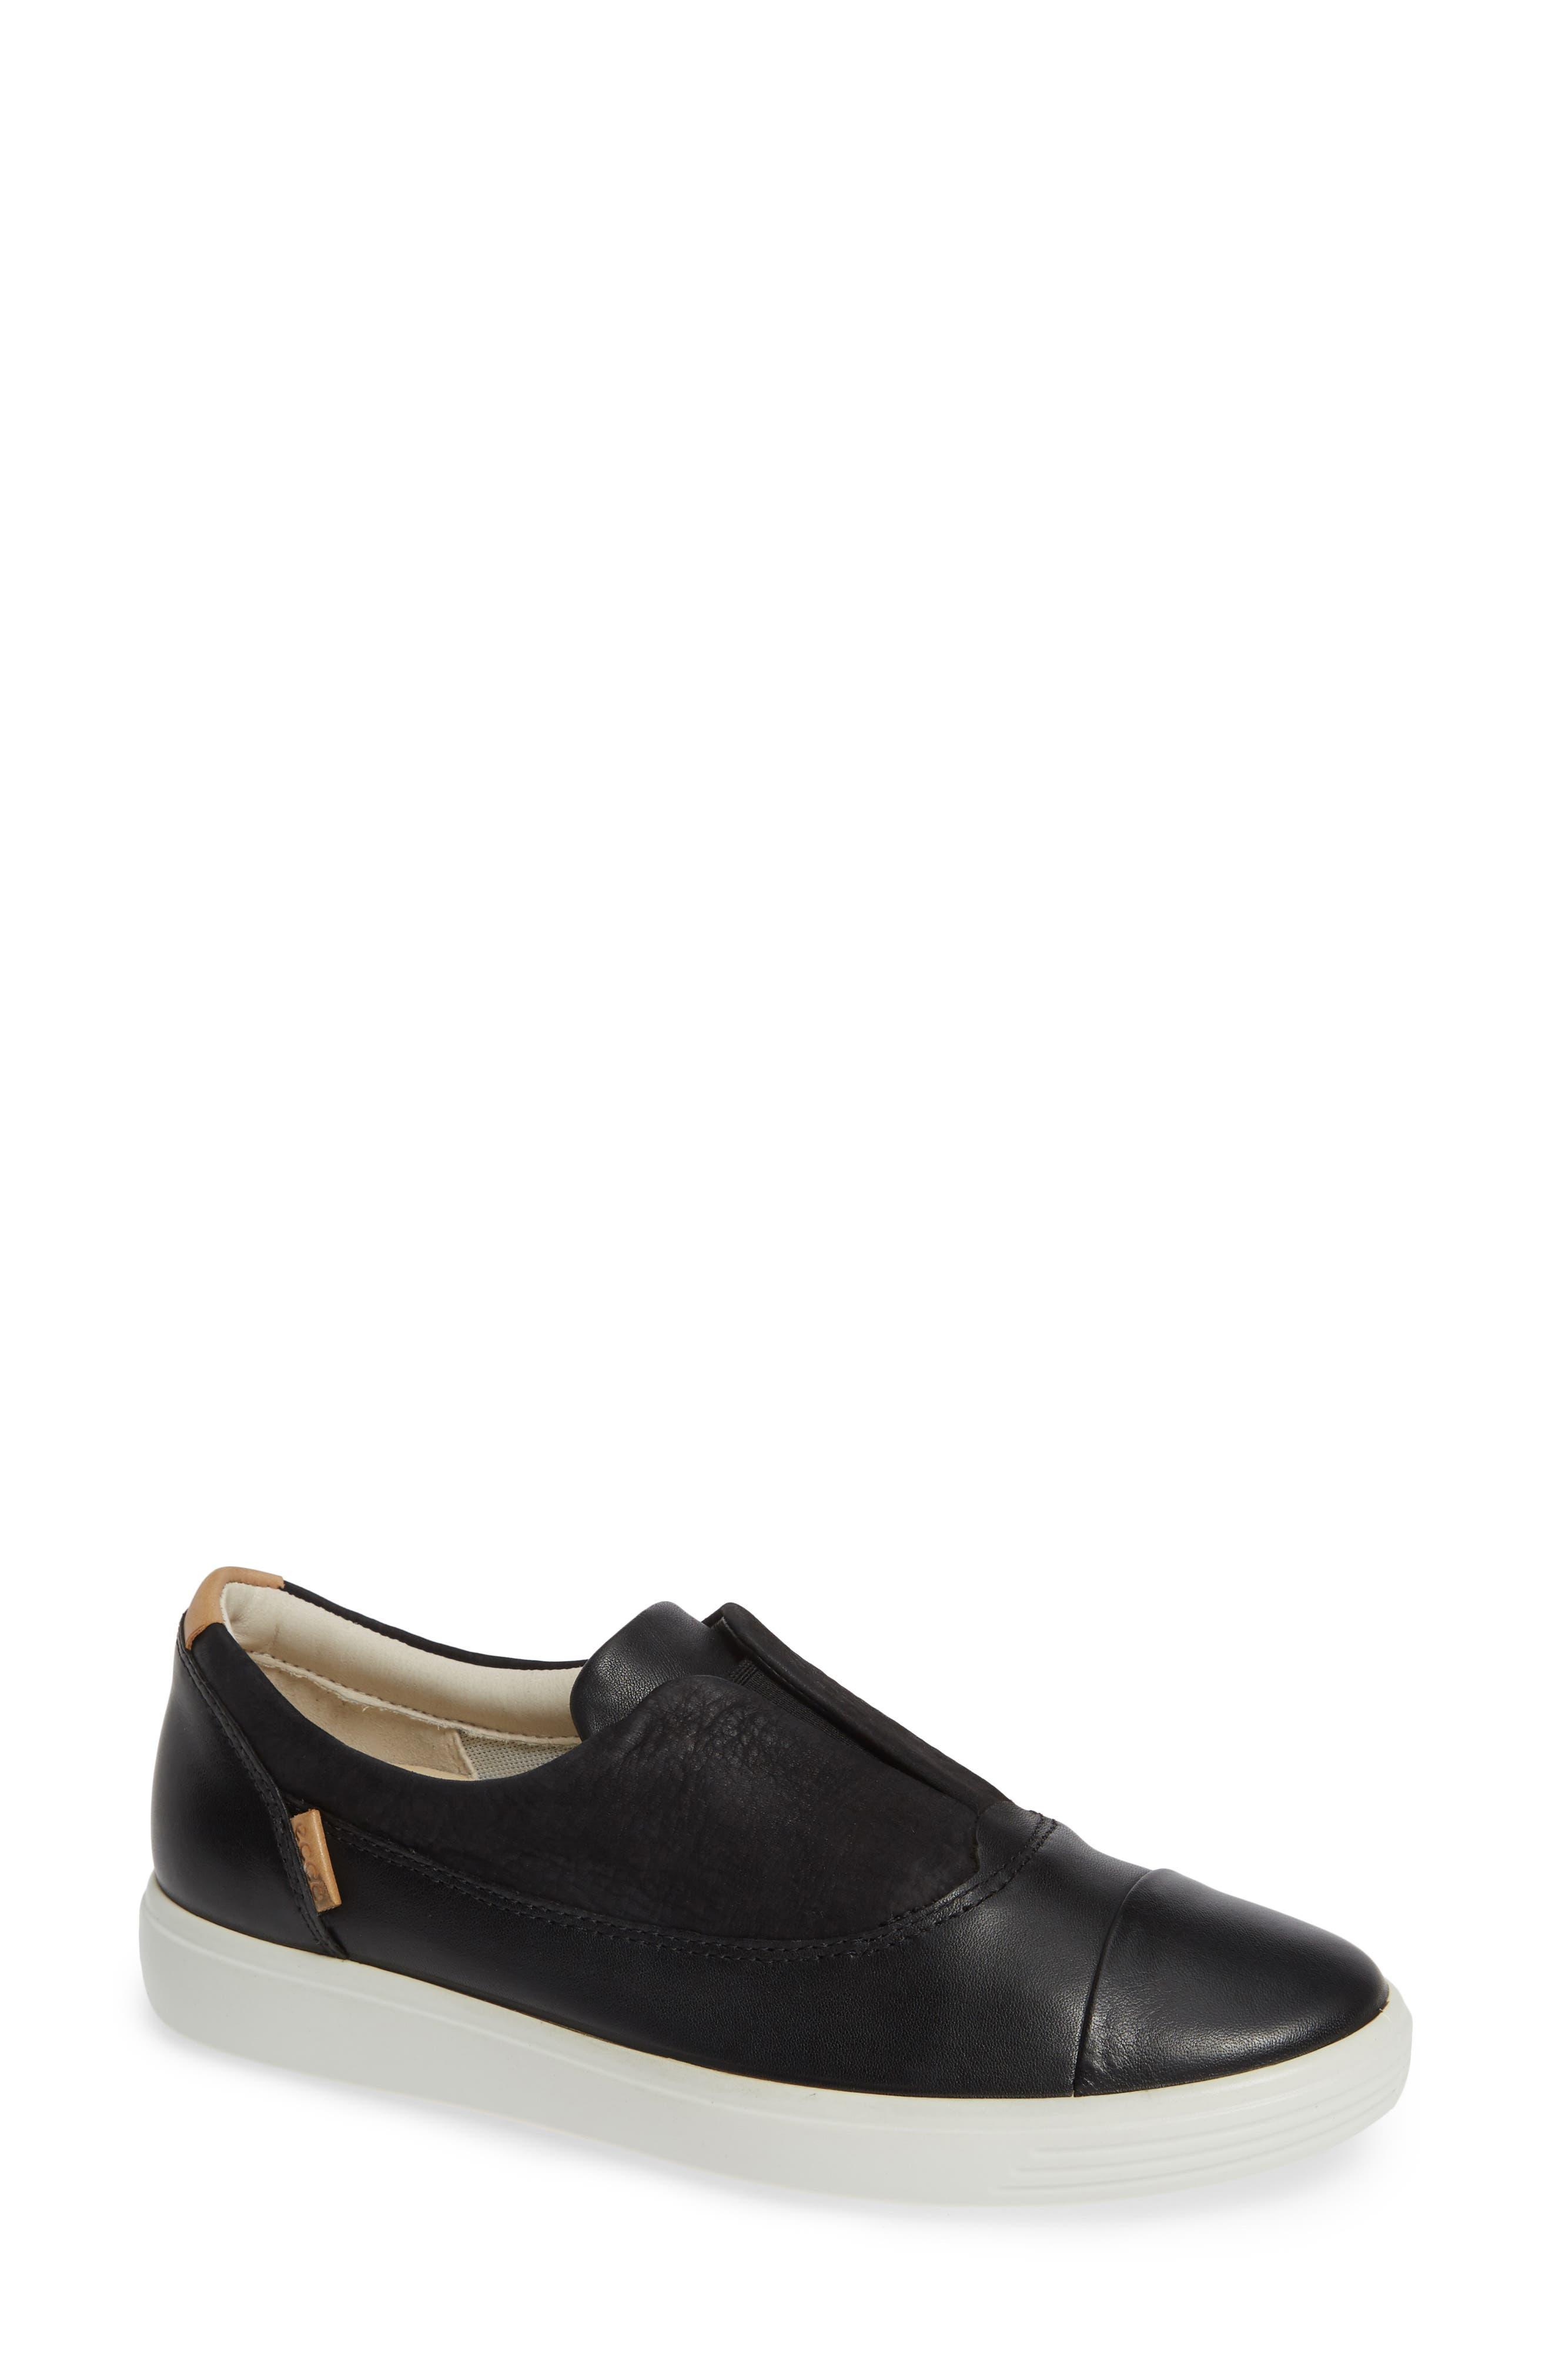 Soft 7 II Slip-On Sneaker, Main, color, BLACK LEATHER